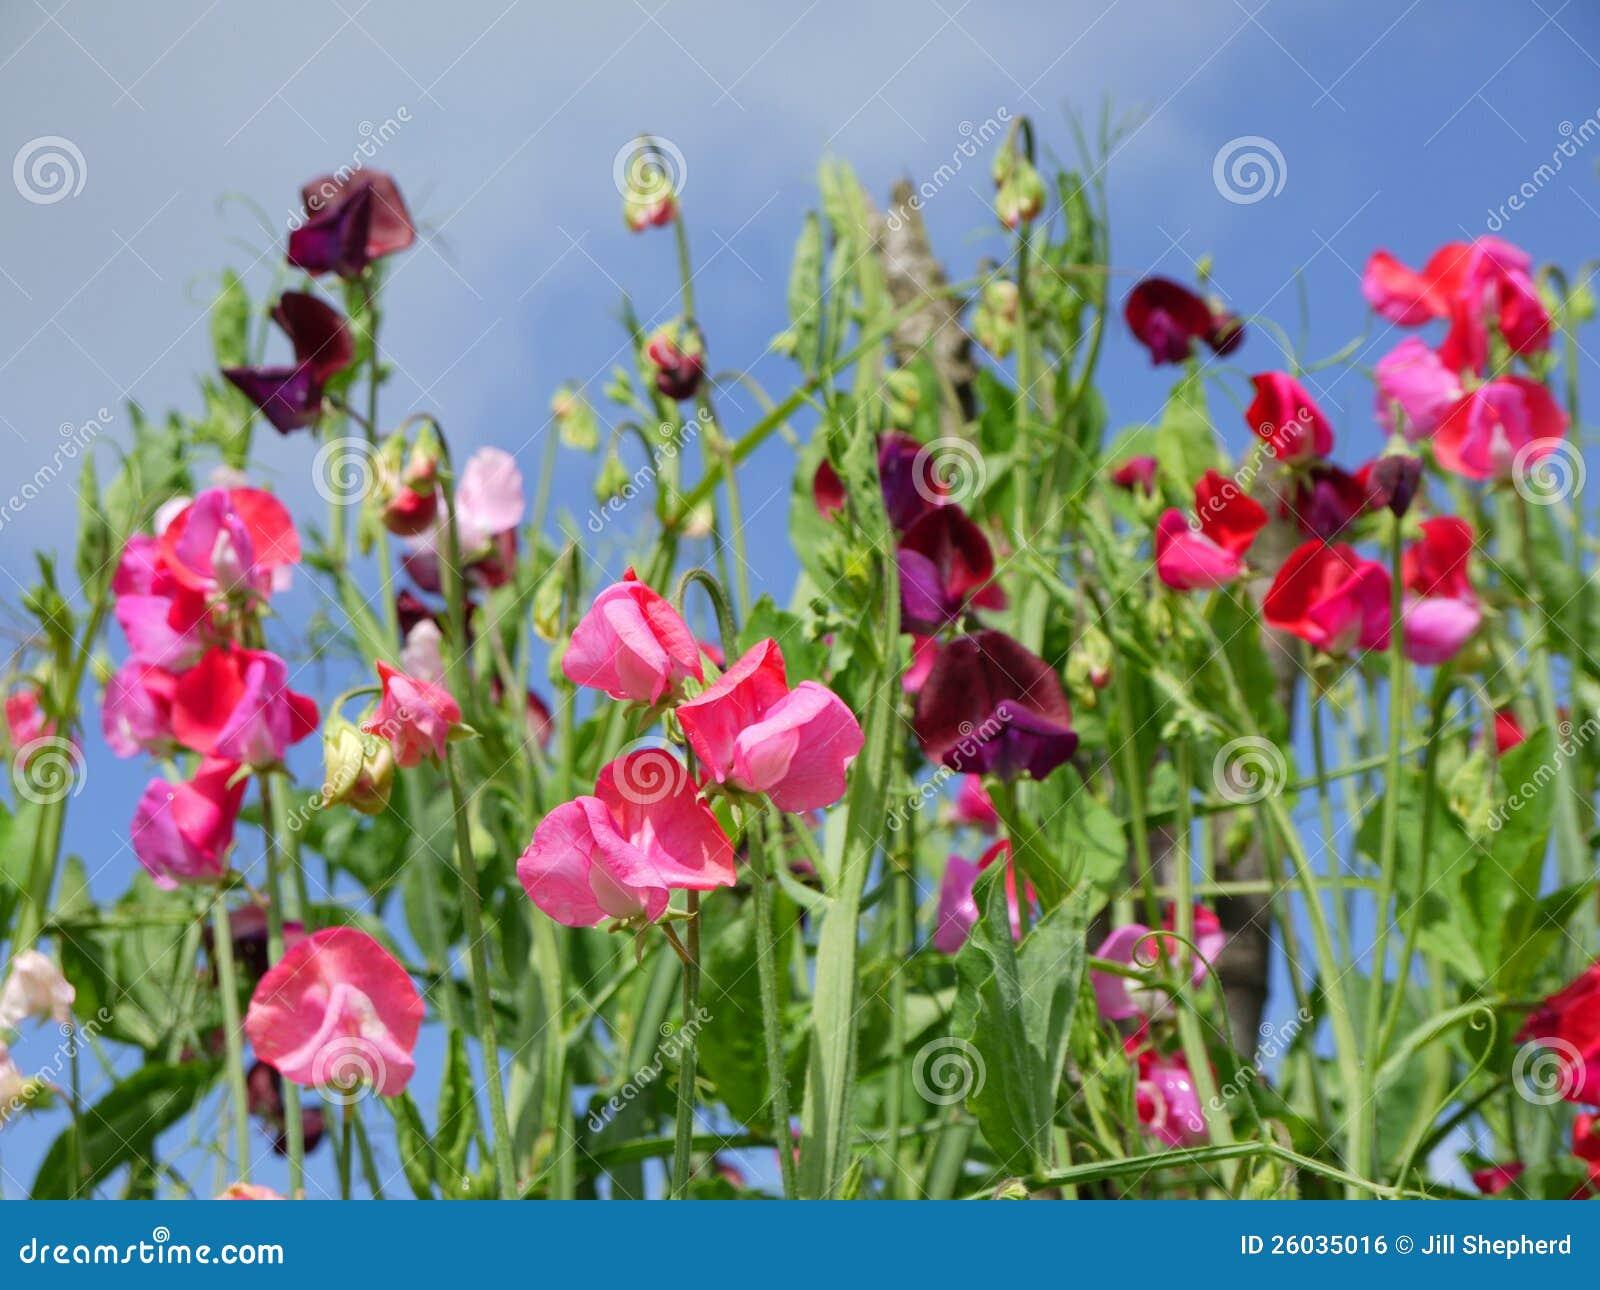 Garden Sweet Pea Flowers H Royalty Free Stock Image Image